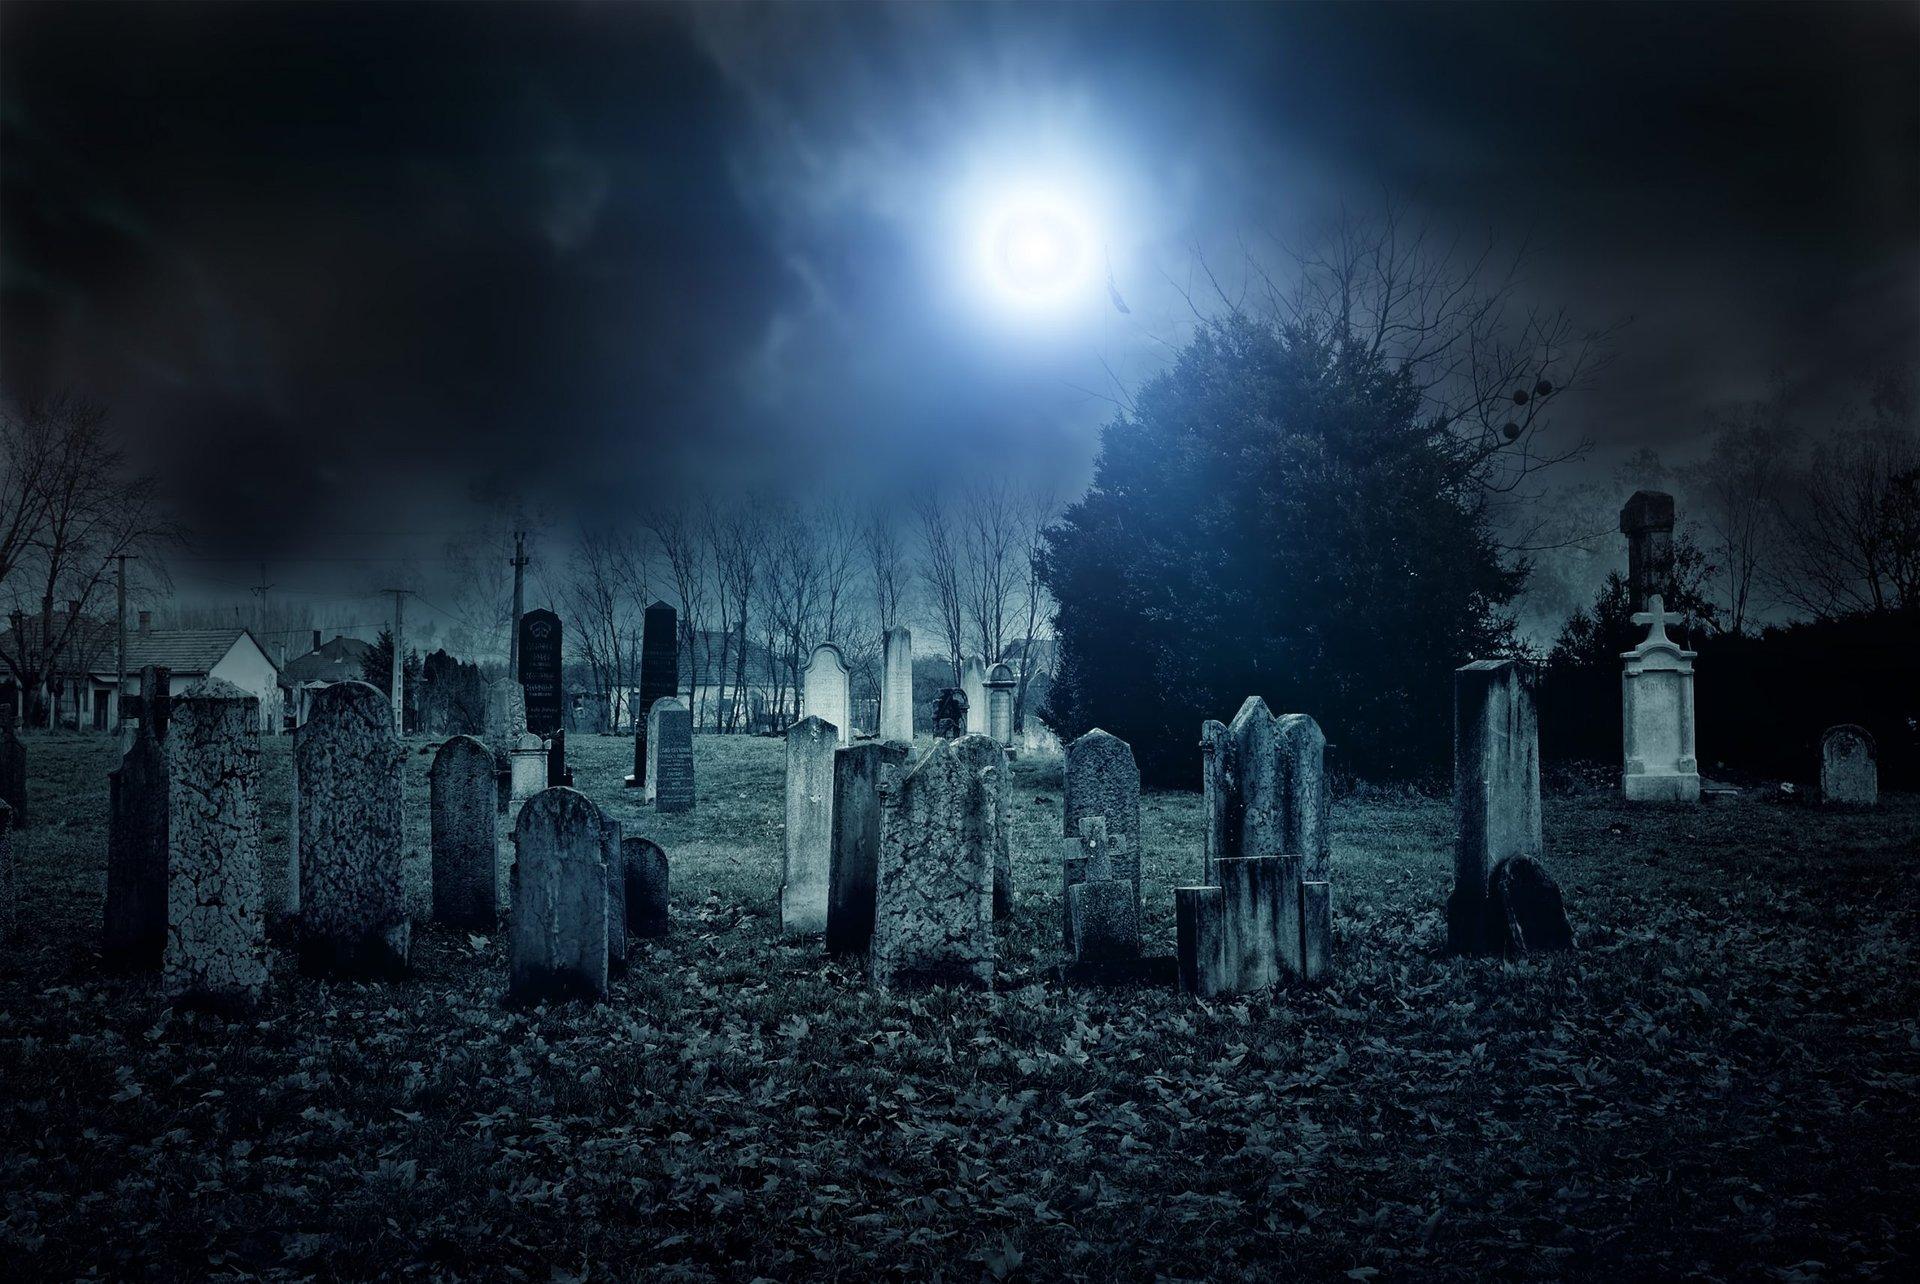 Dark oaks graveyard detail image